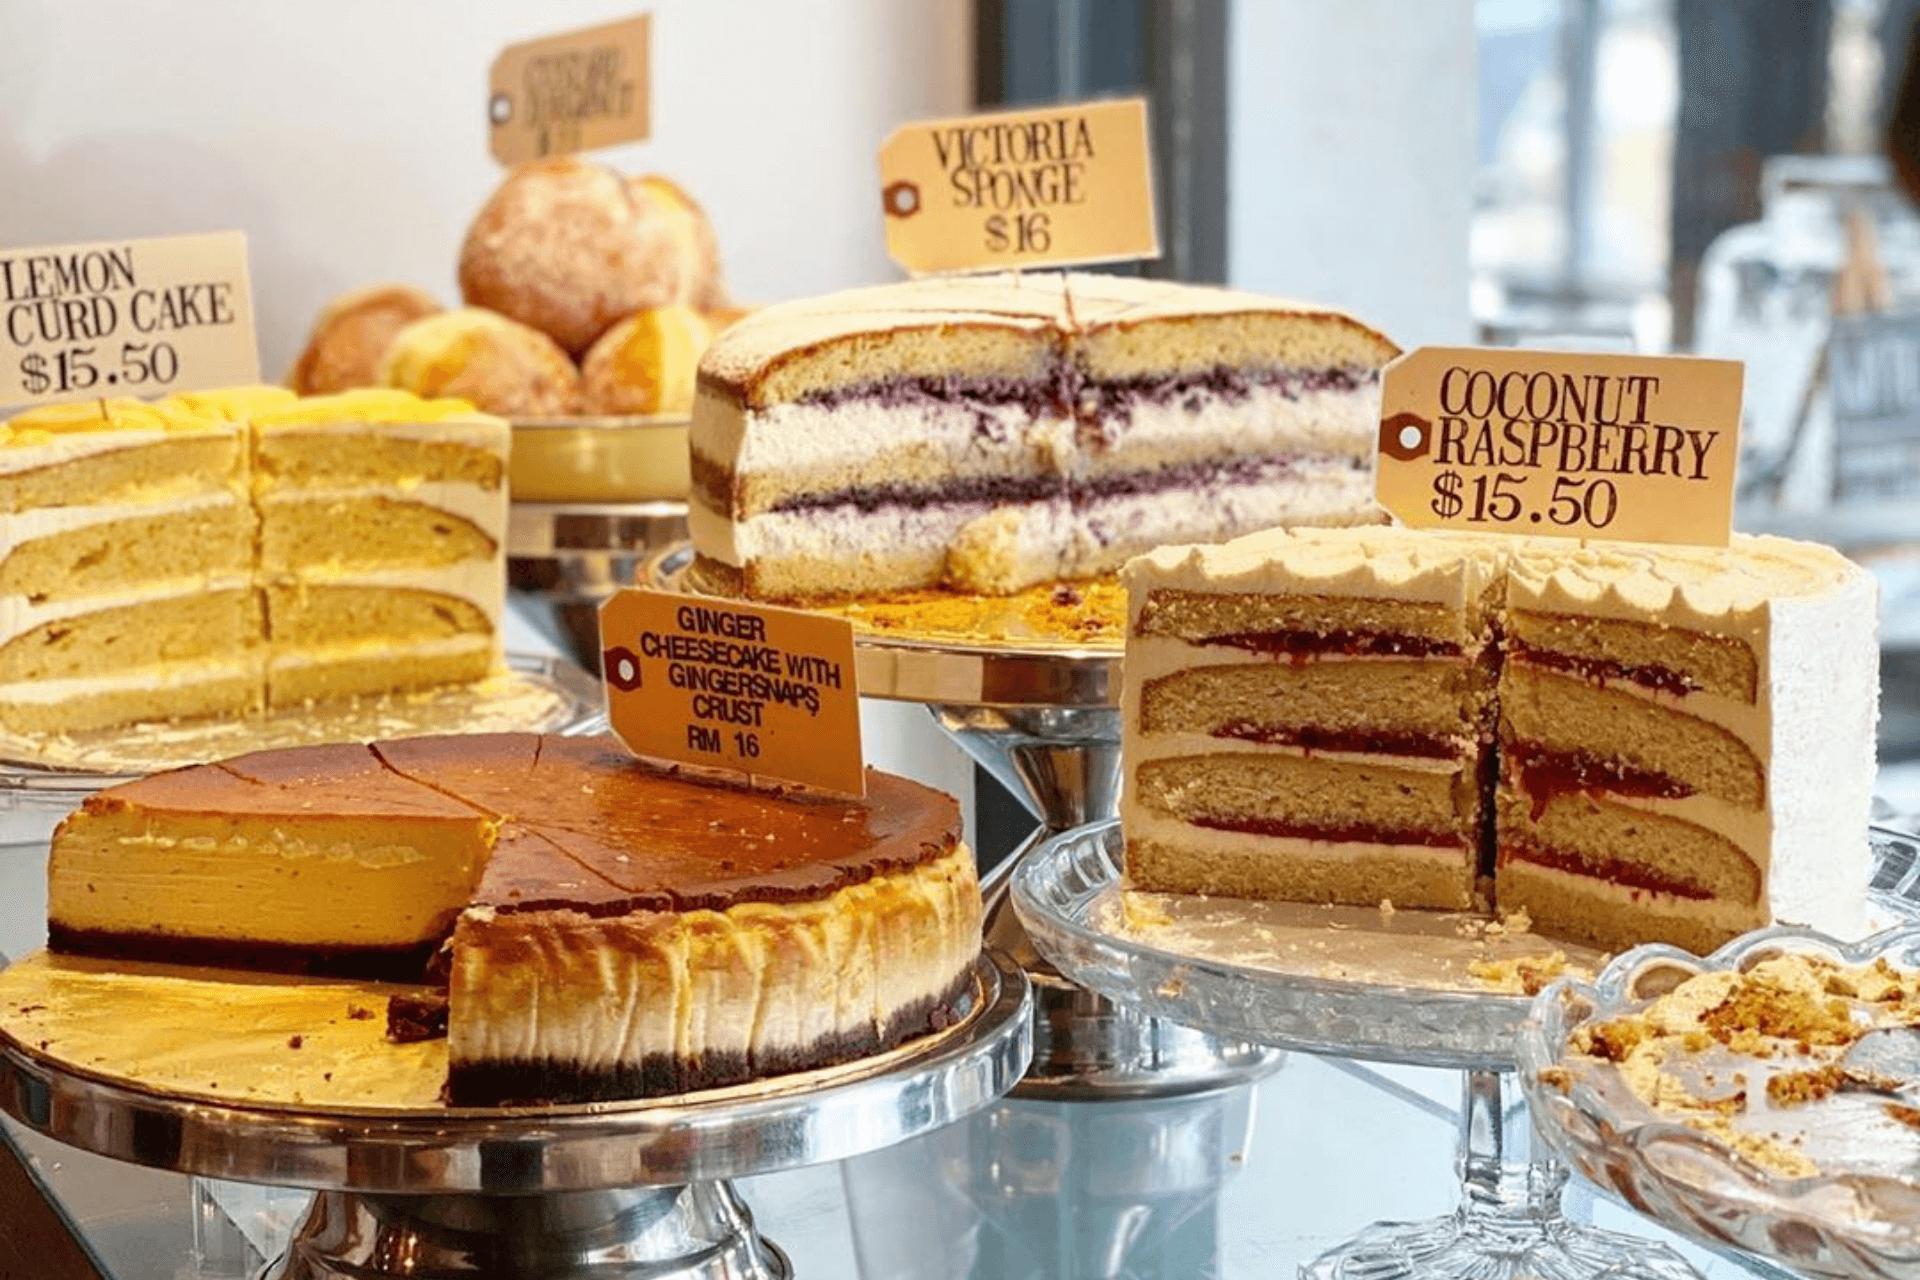 10 Toko Roti Terbaik di Kuala Lumpur